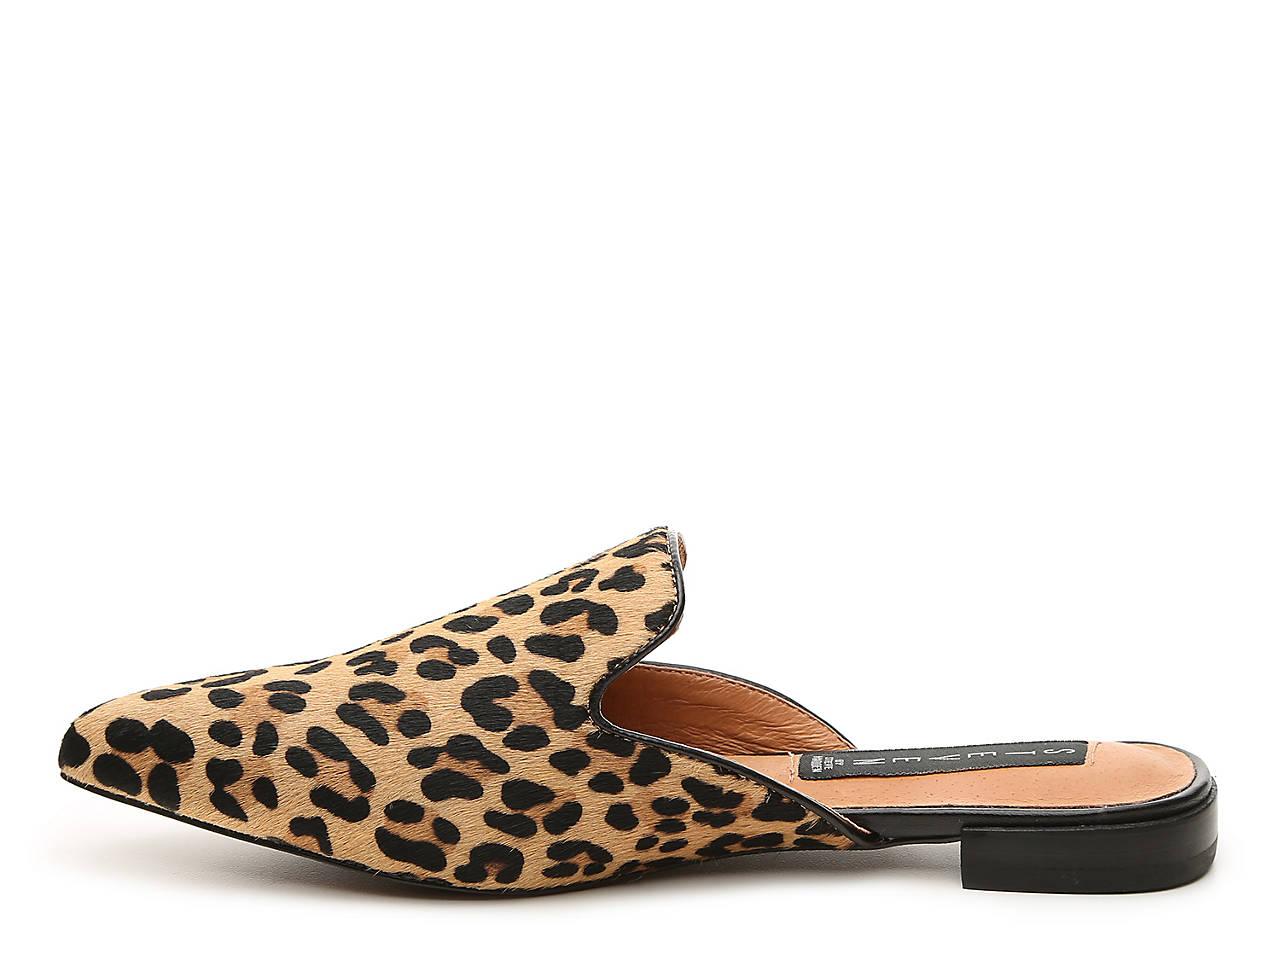 cbe4408cc96 Steven by Steve Madden Valent Mule Women s Shoes